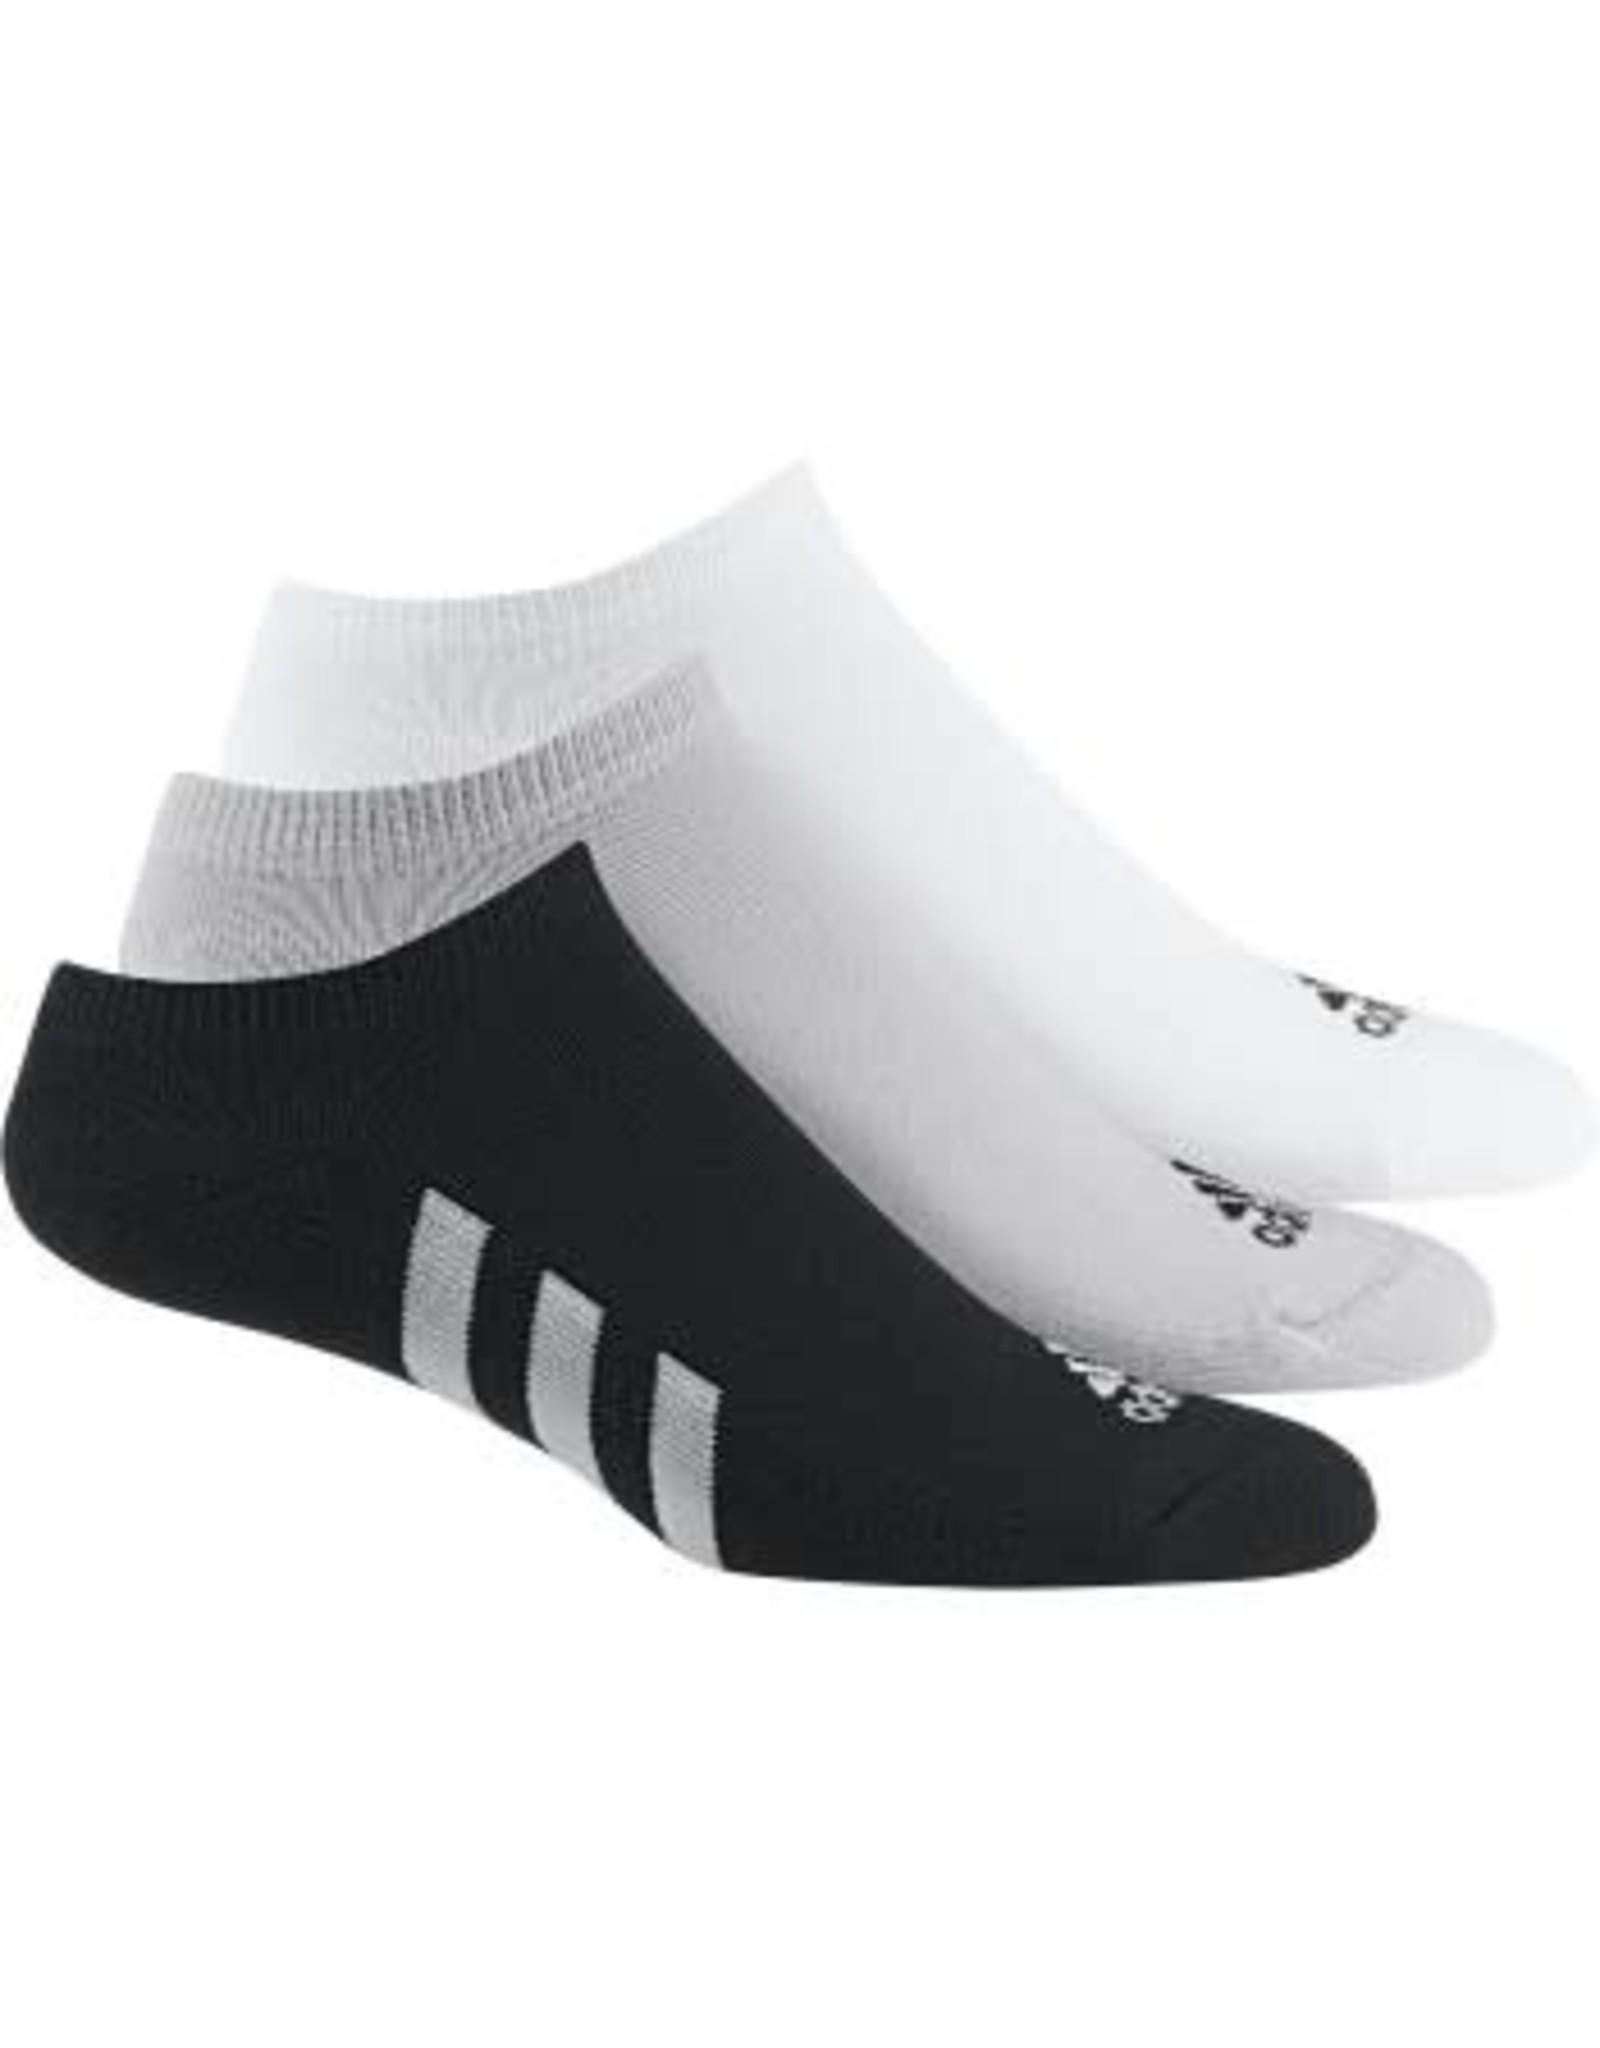 Adidas Adidas Men's 3 Pack NoShow Socks